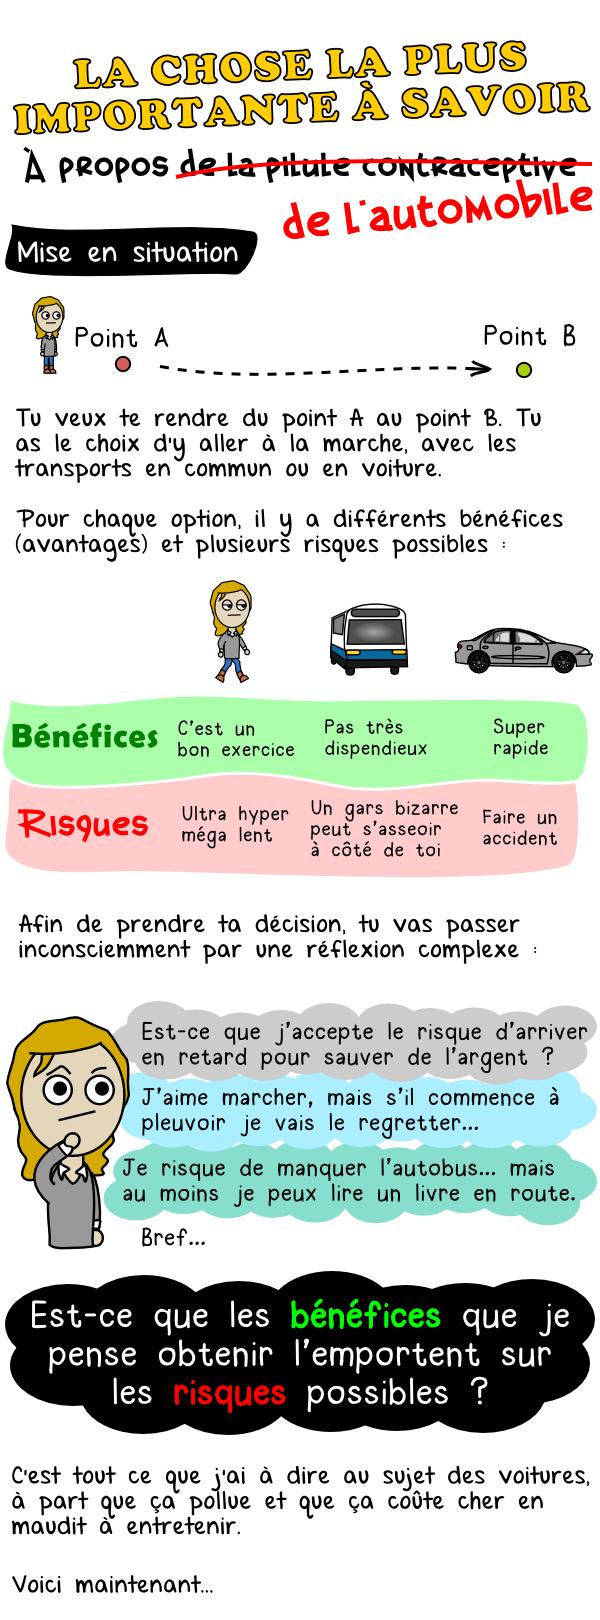 Risques de prendre l'automobile